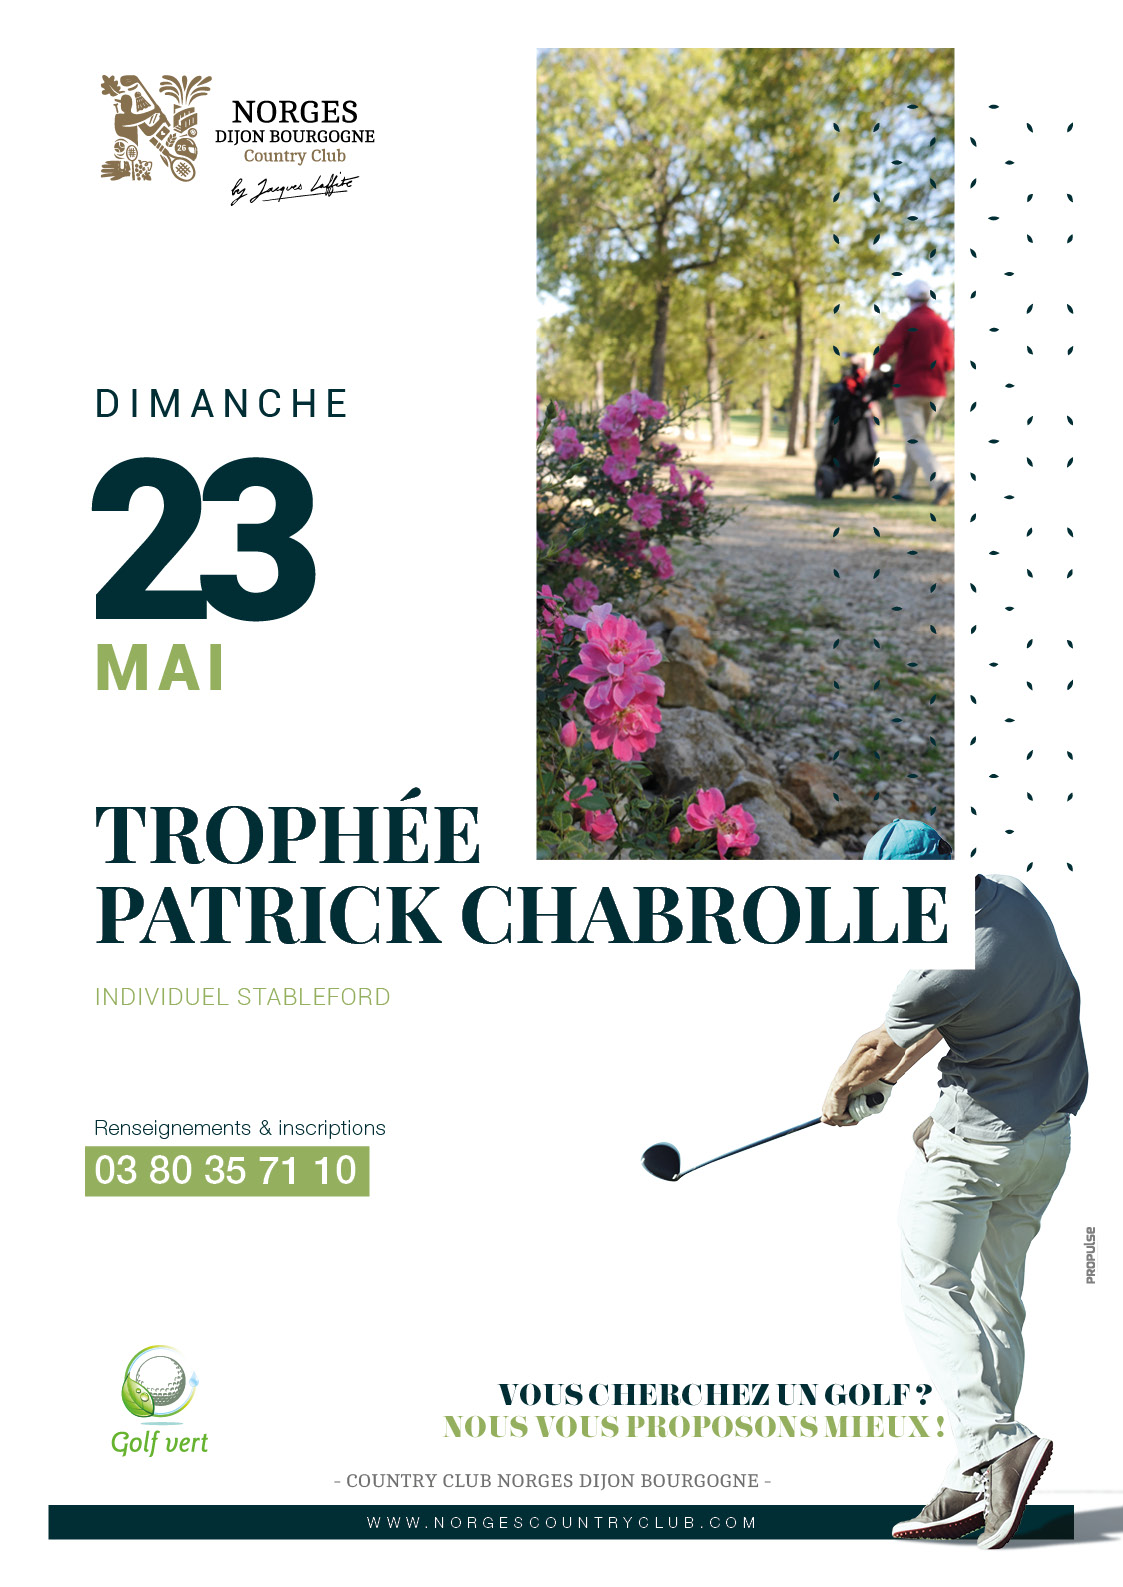 Trophée Patrick Chabrolle